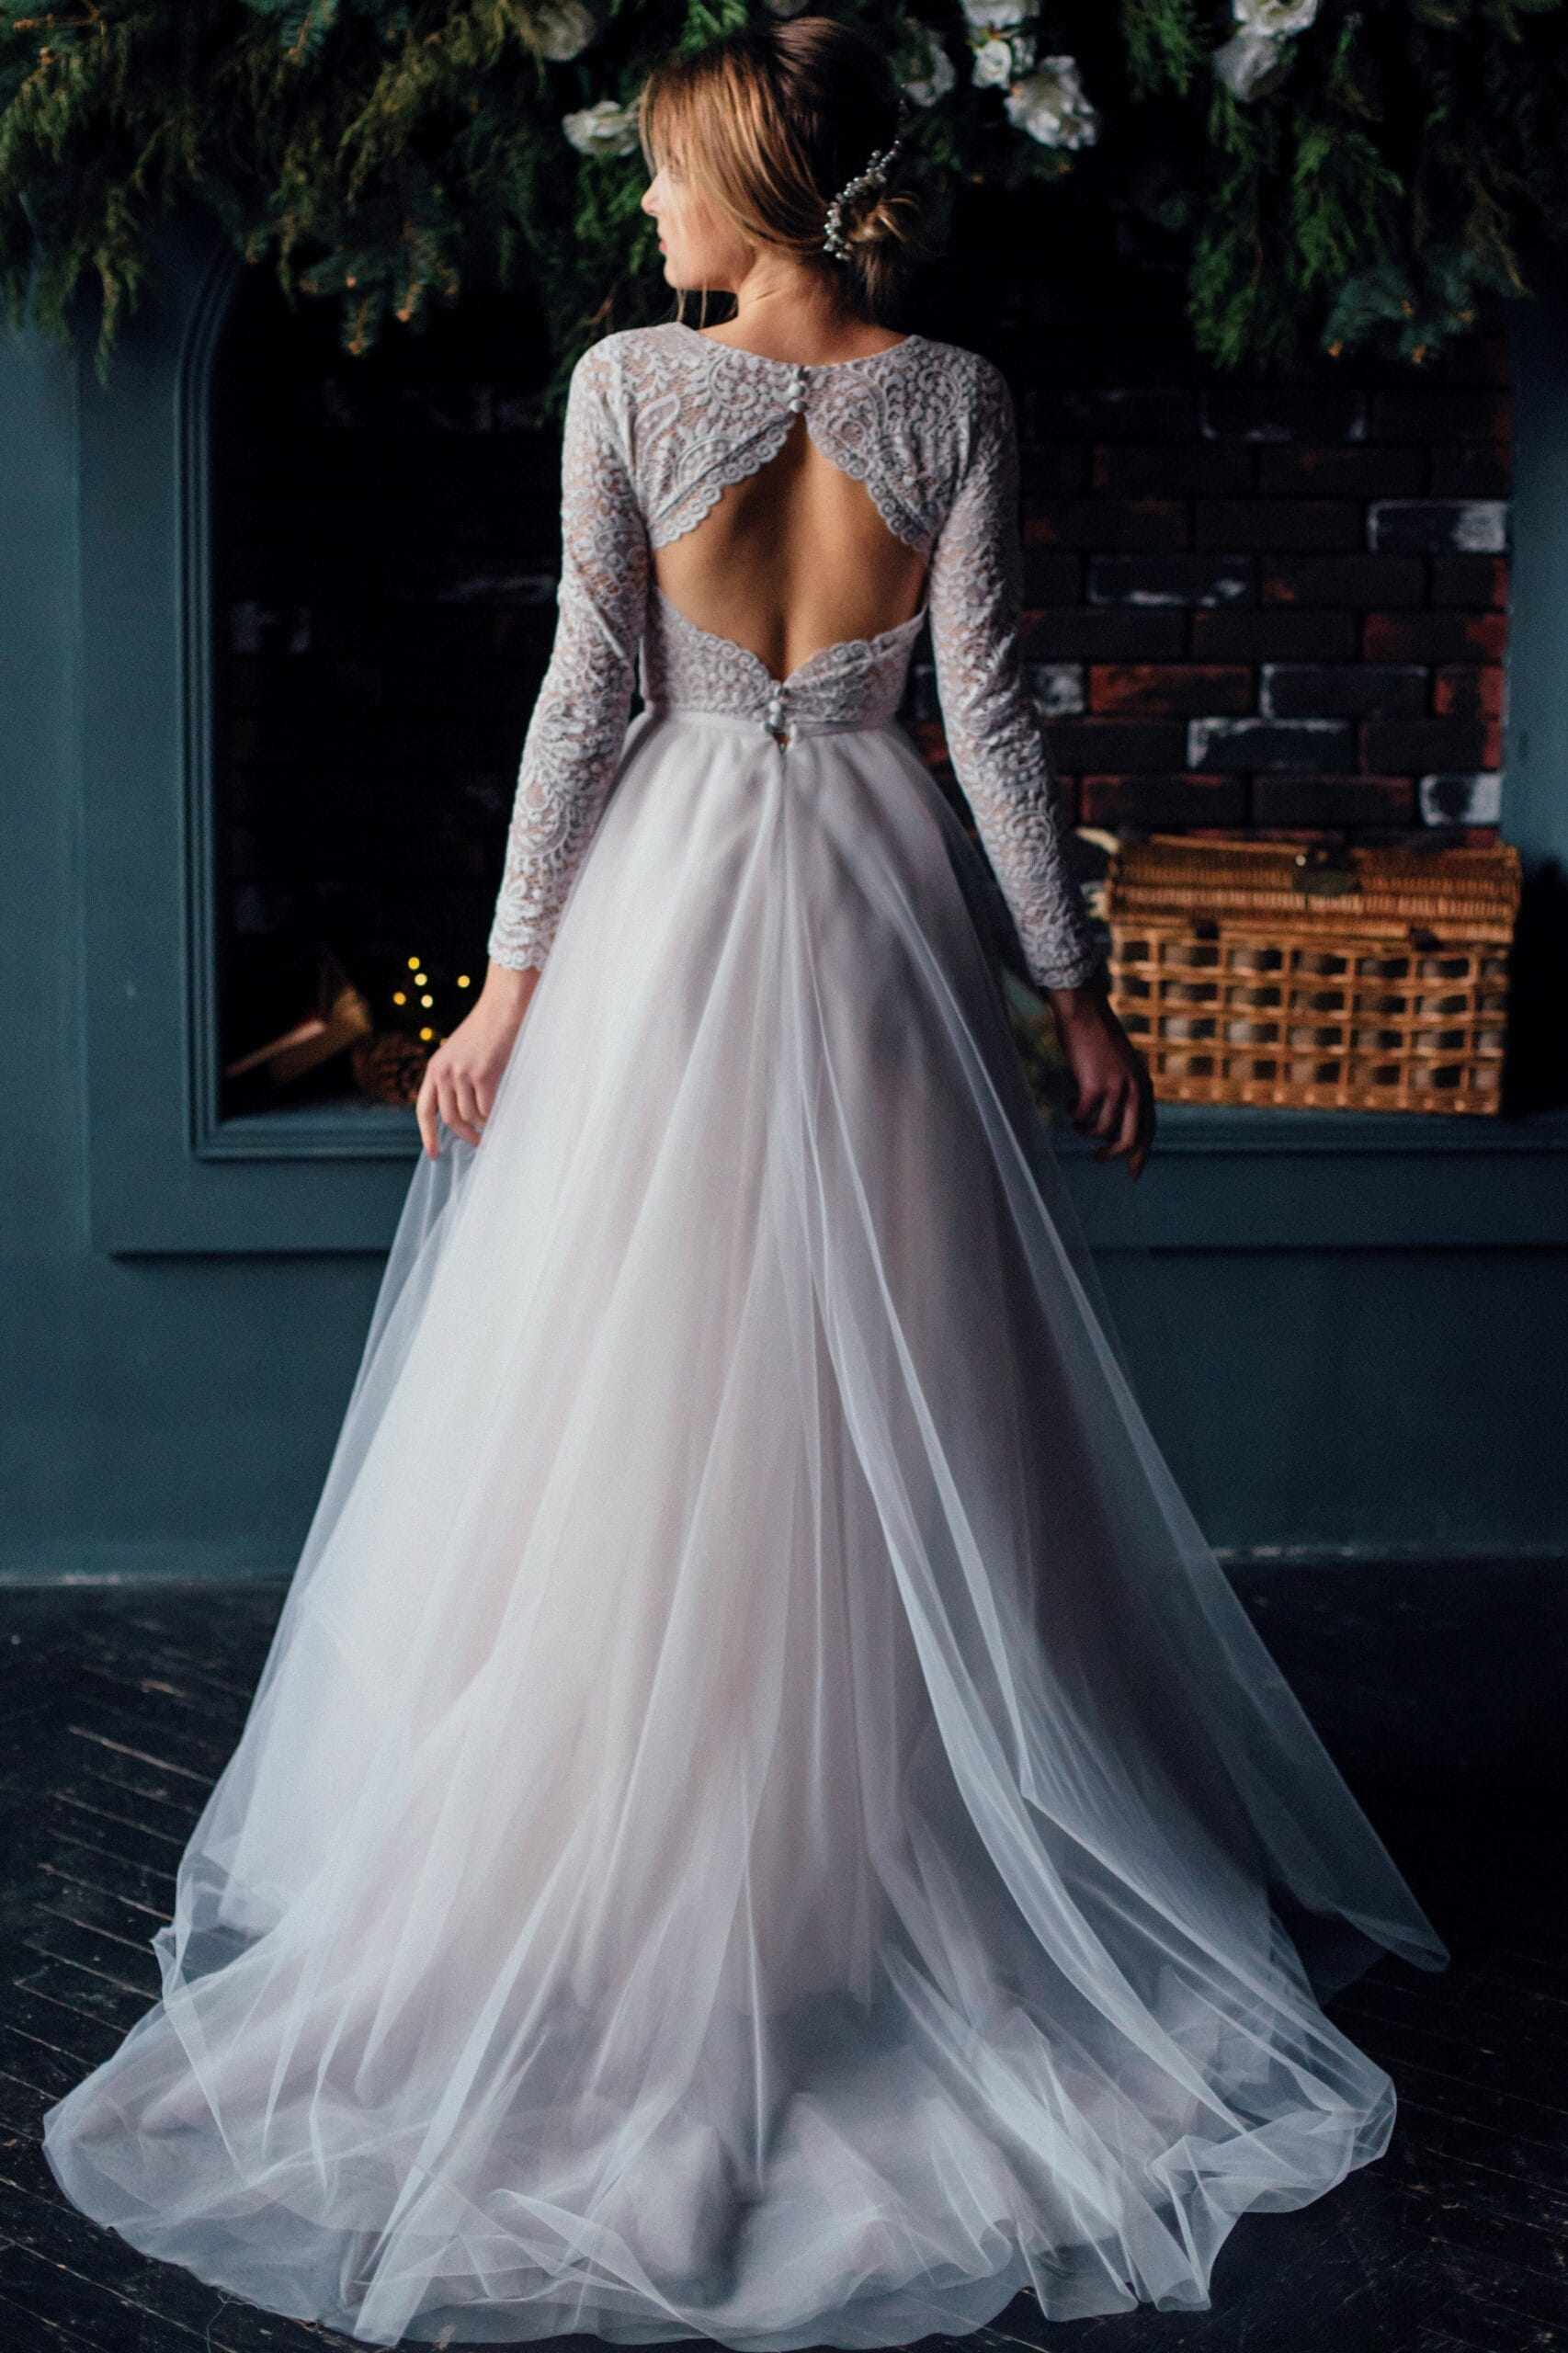 Свадебное платье CAROLINE, коллекция THE ABSOLUTE LOVE, бренд RARE BRIDAL, фото 2